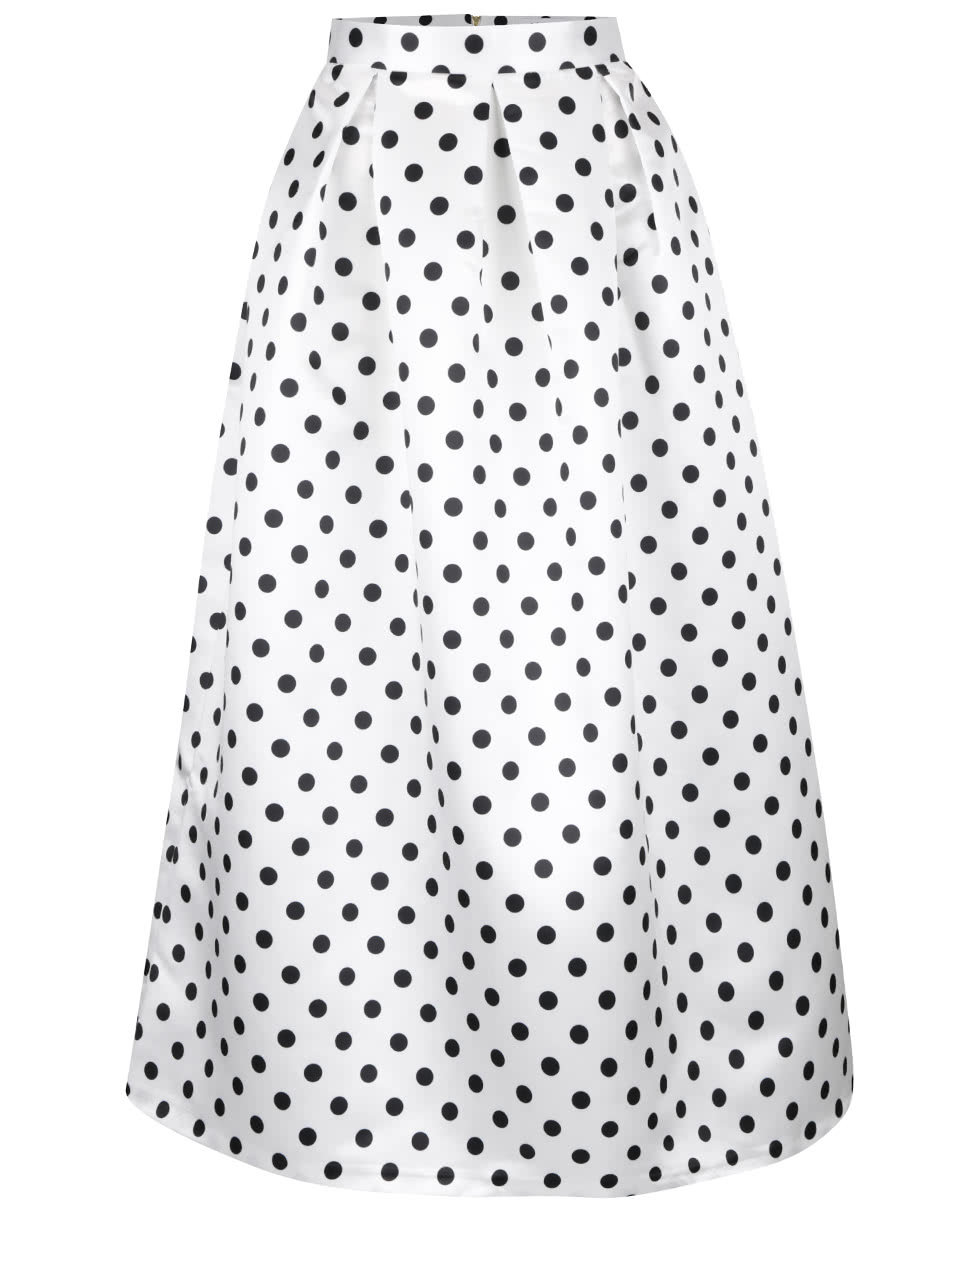 a845154ae72 Černo-bílá lesklá maxi sukně s puntíky Closet ...